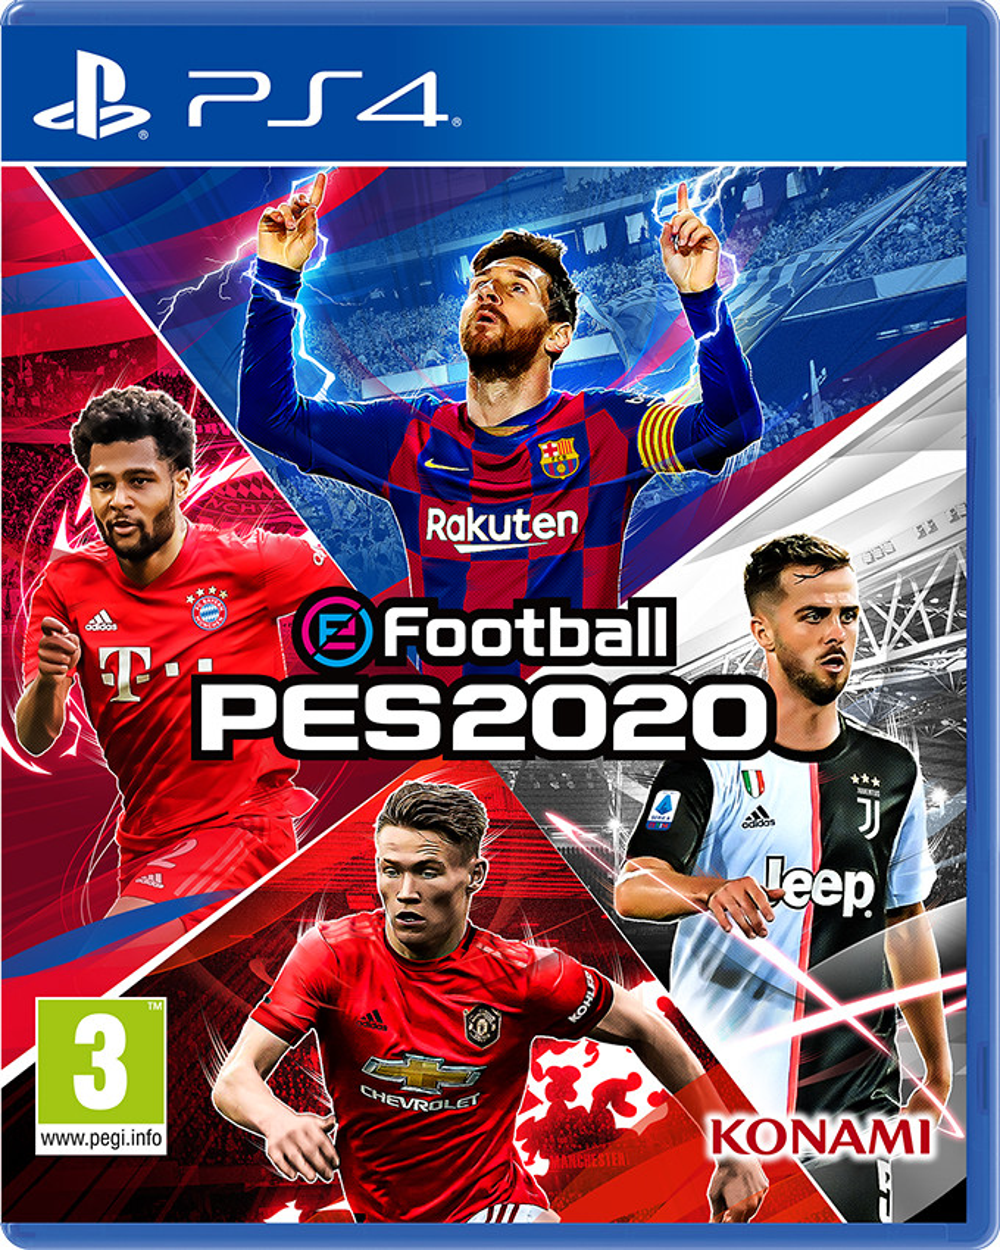 PS4 eFootball PES 2020 - Pro Evolution Soccer 2020